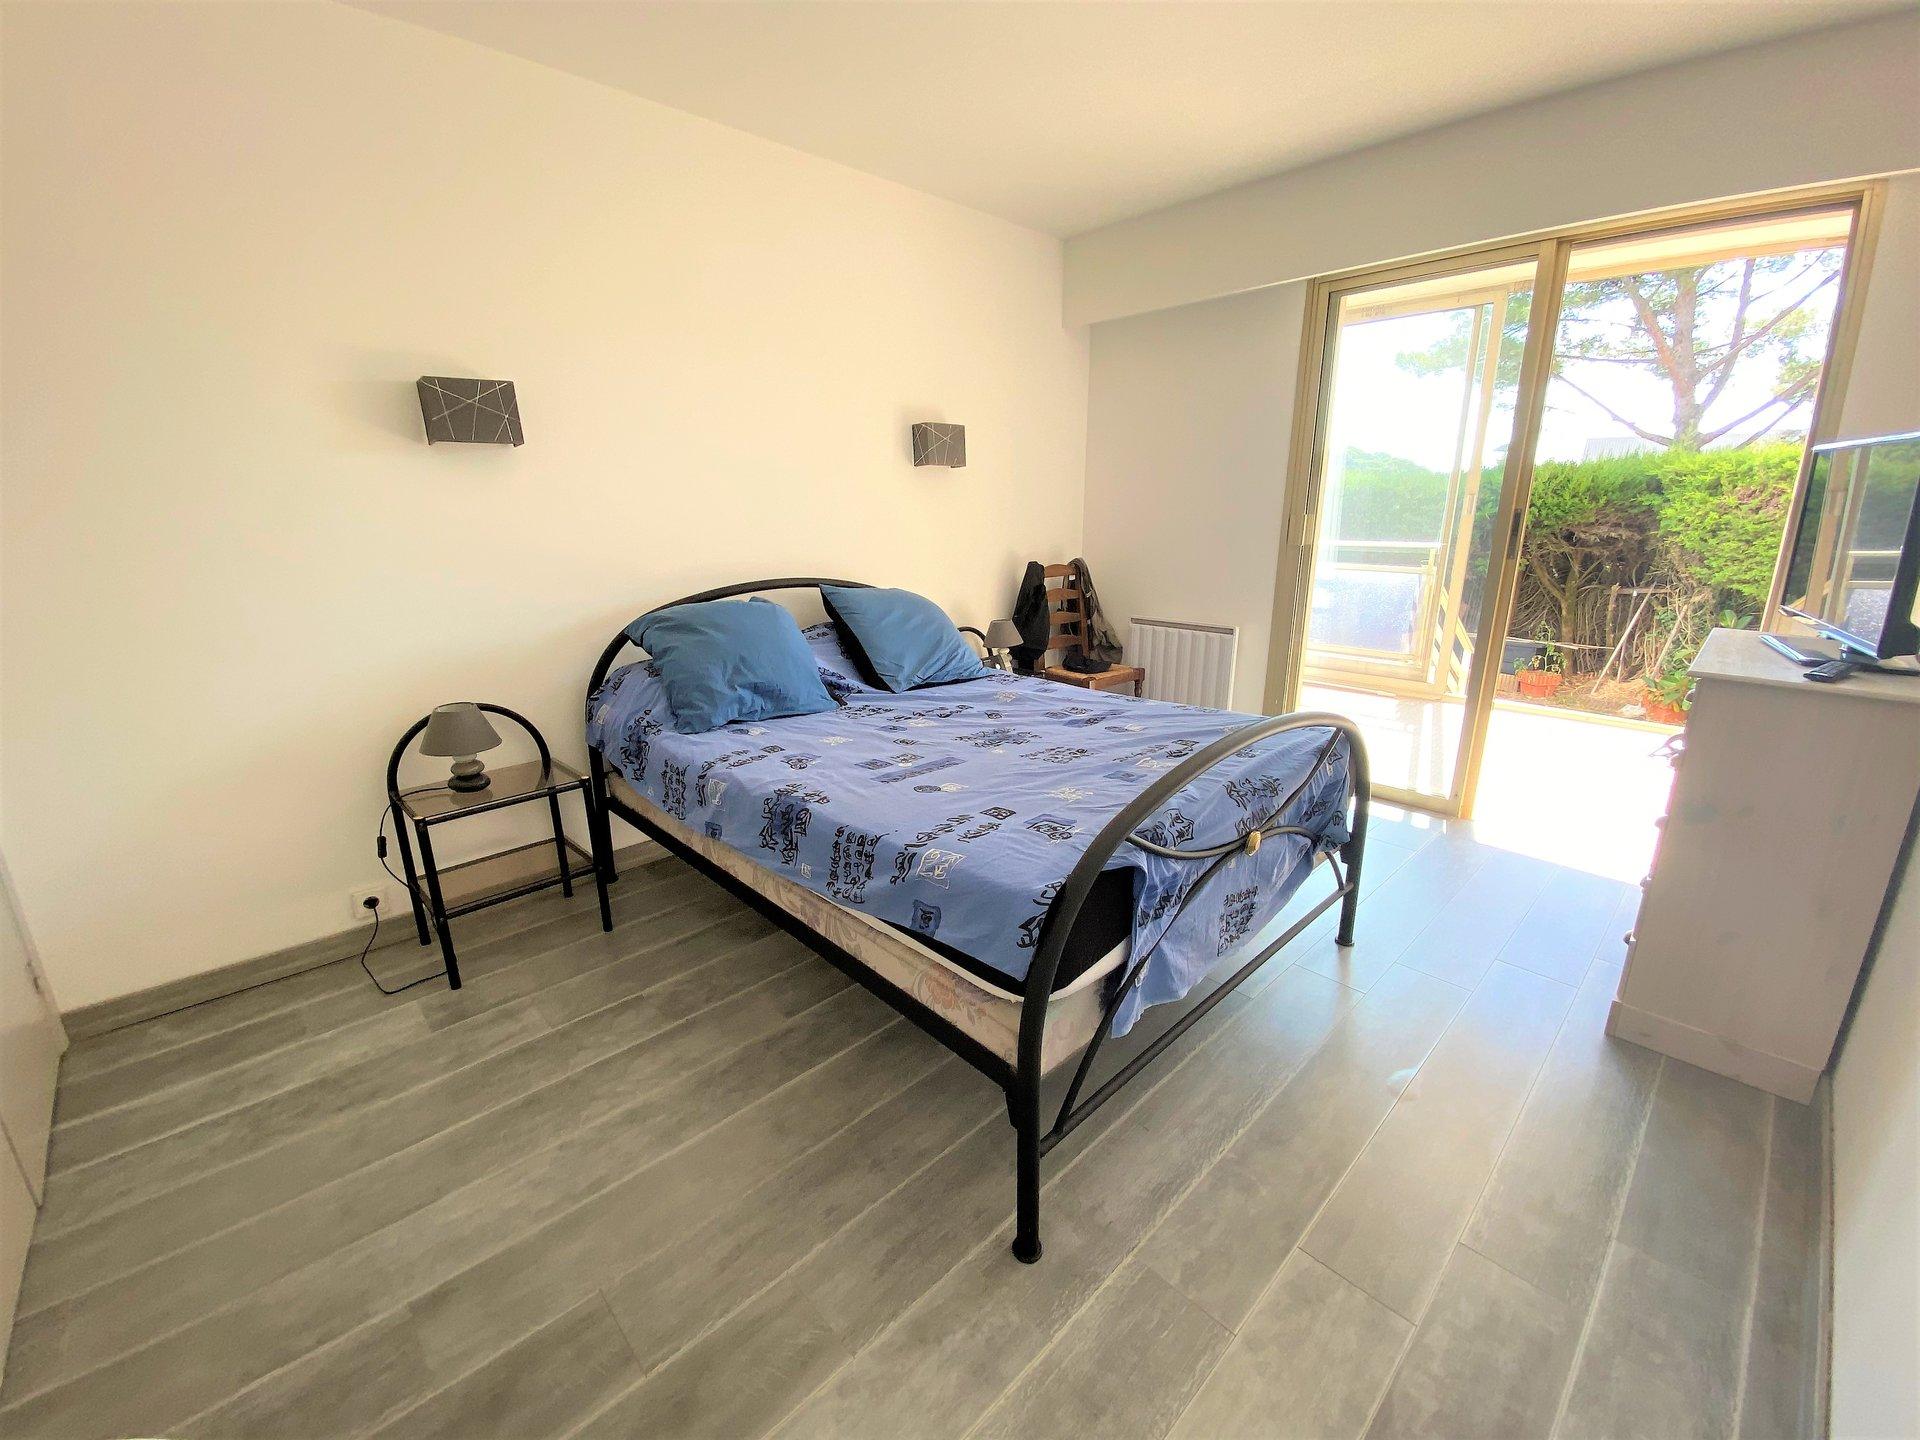 Vendita Appartamento - Le Cannet L'Aubarède